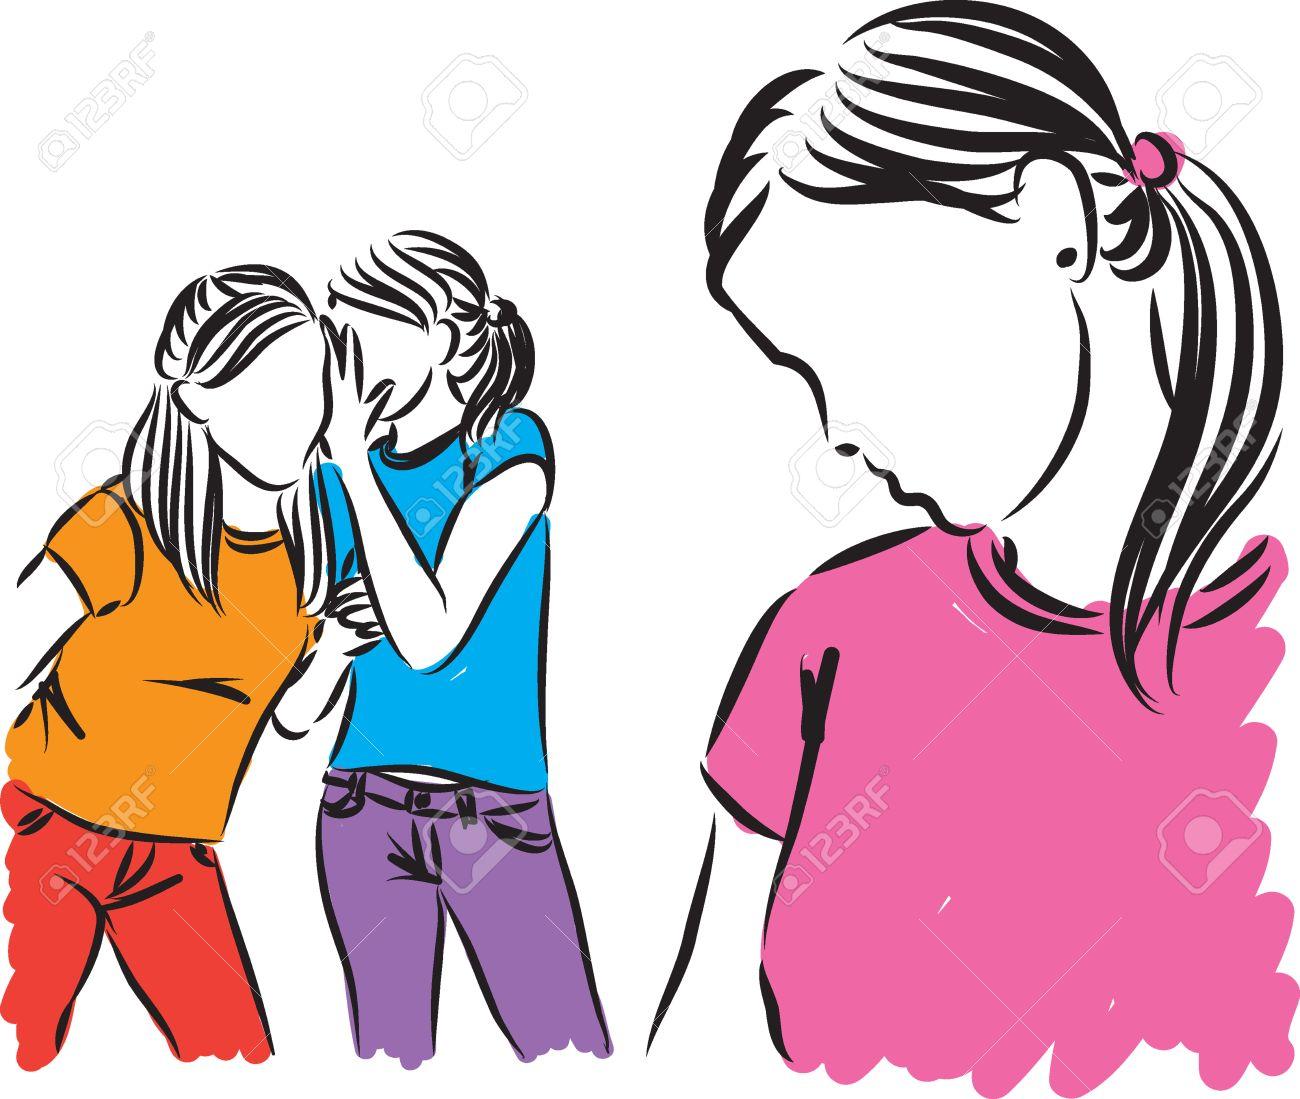 girls teenagers gossip illustration - 57805584